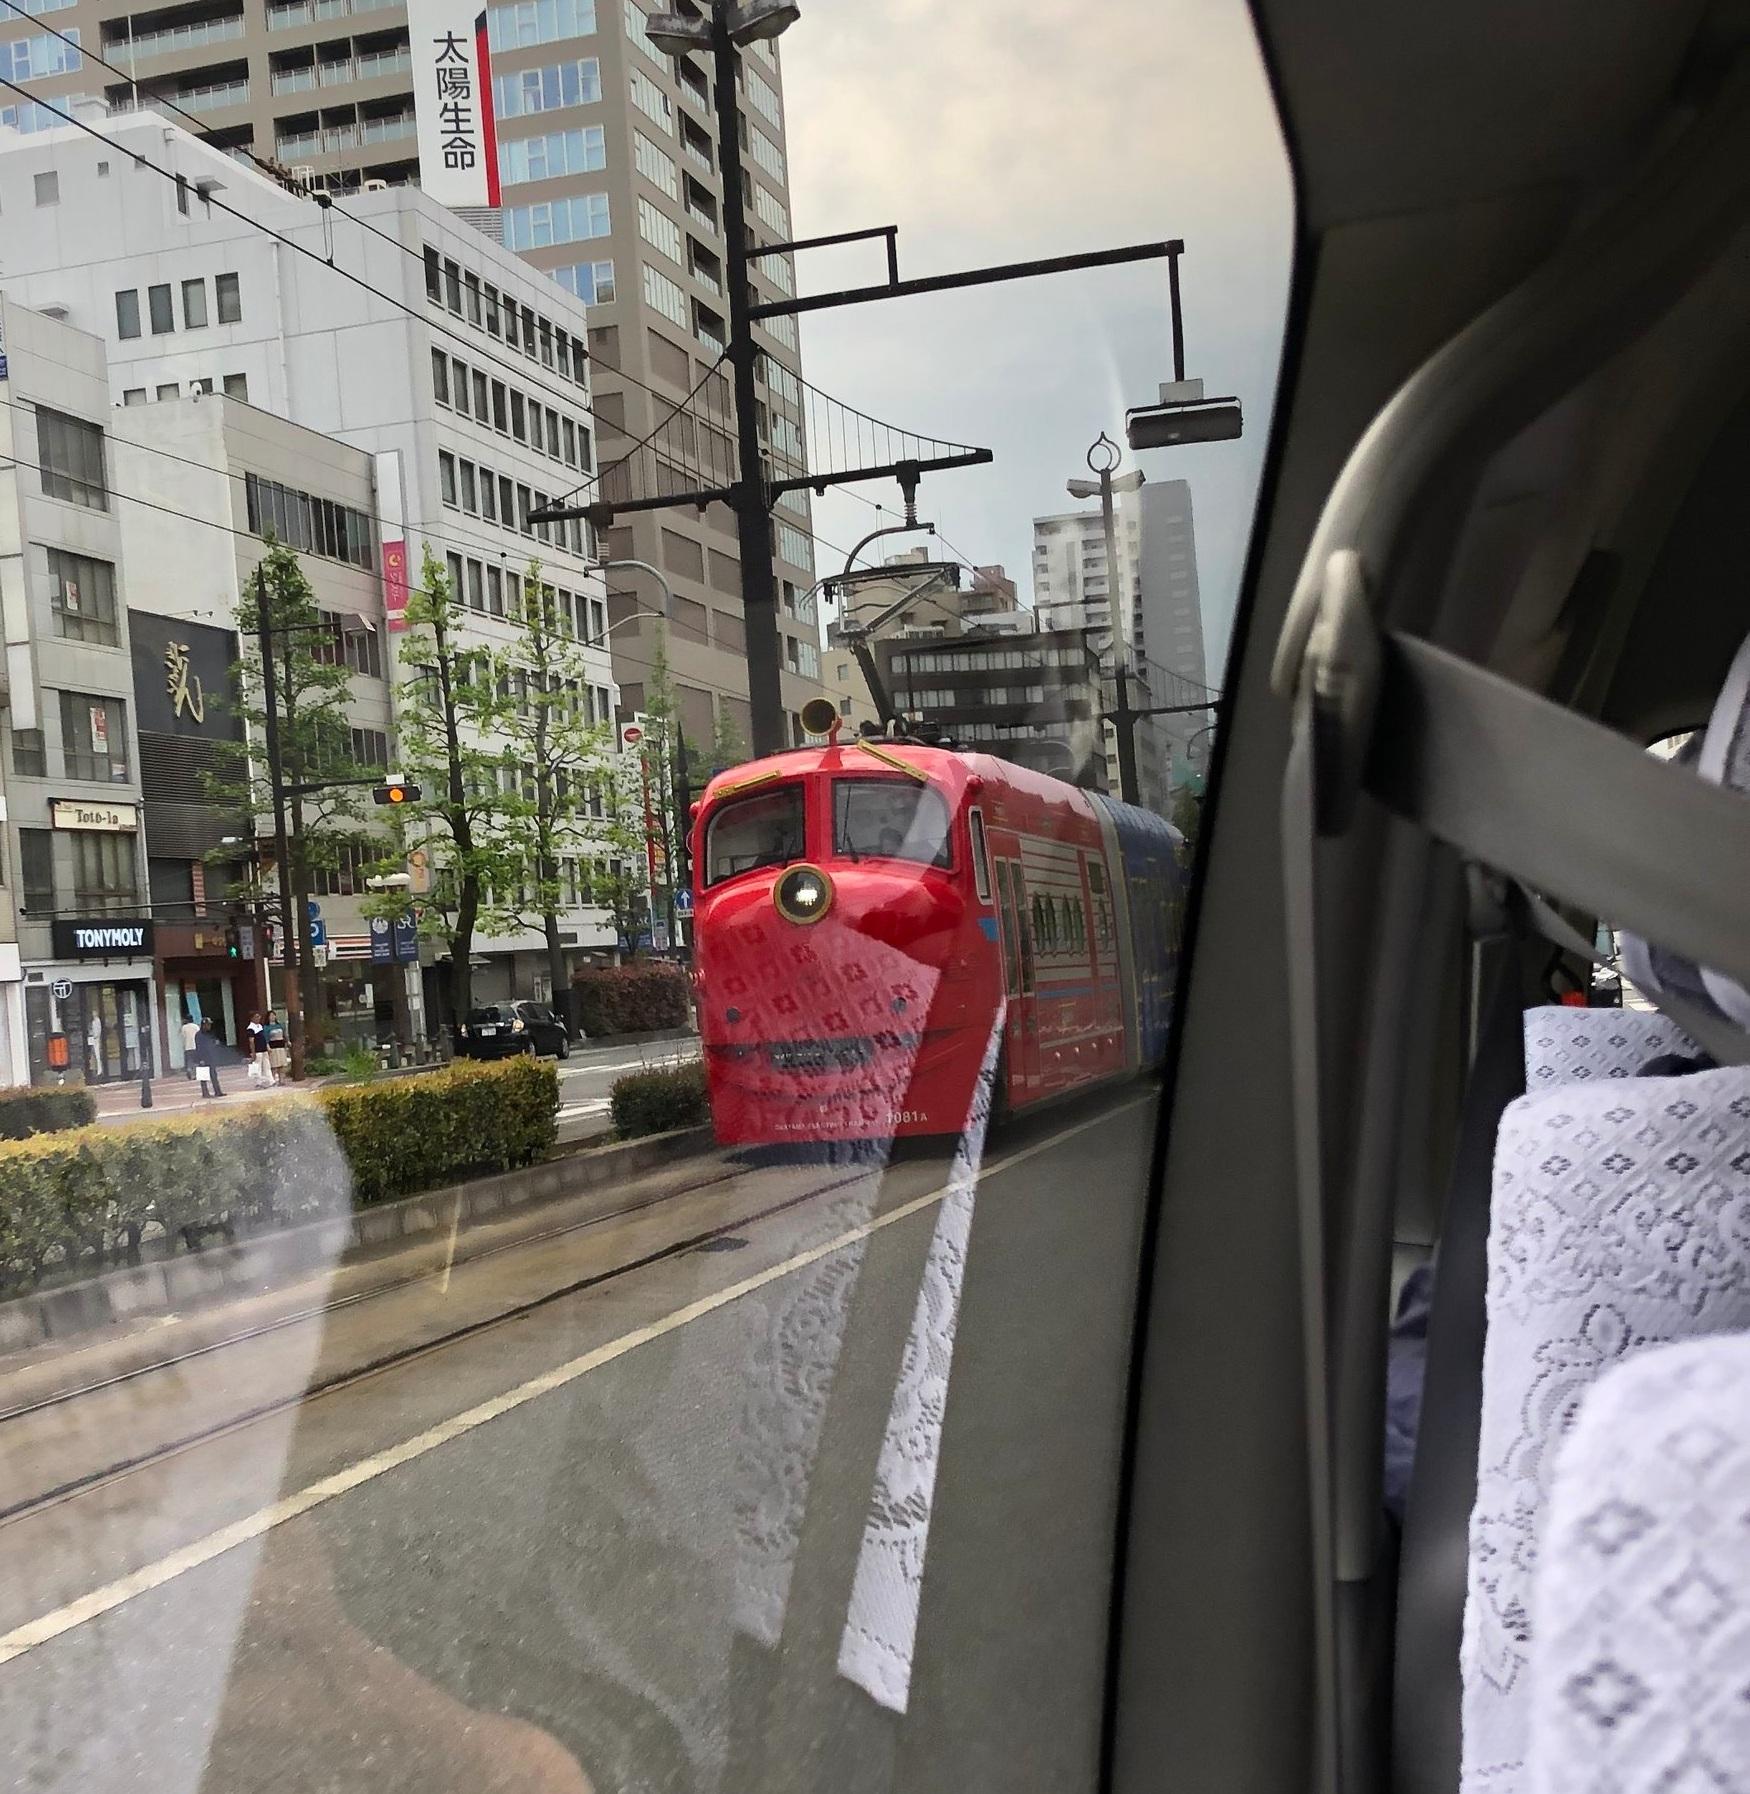 Boaty McBoatface (train on the streets of Okayama)